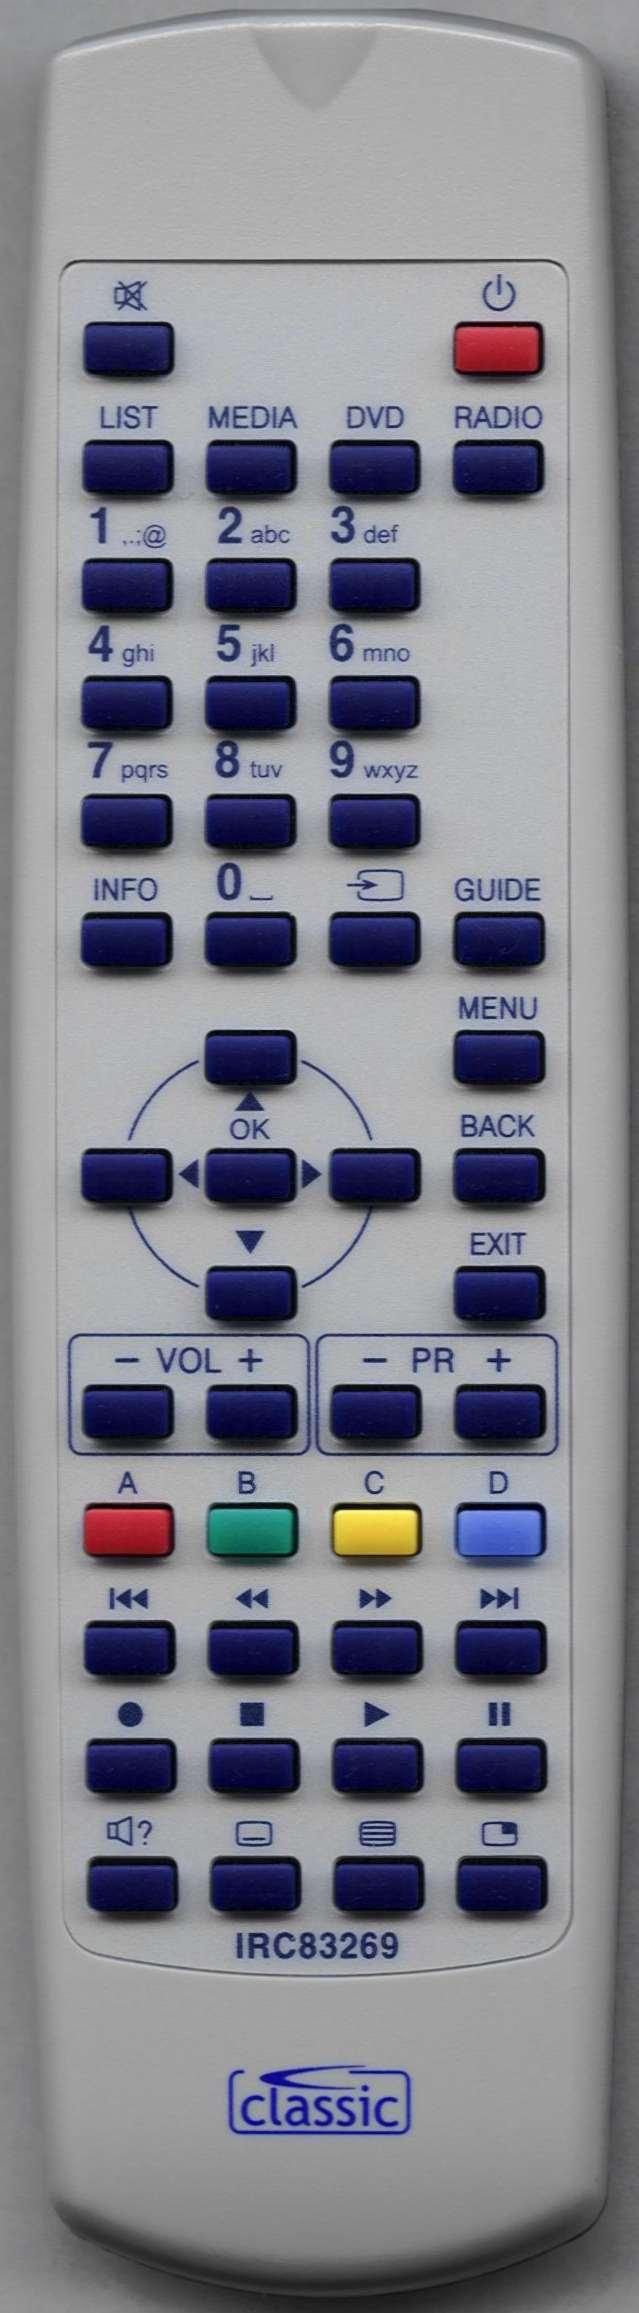 SAGEMCOM DTR6700T Remote Control Alternative